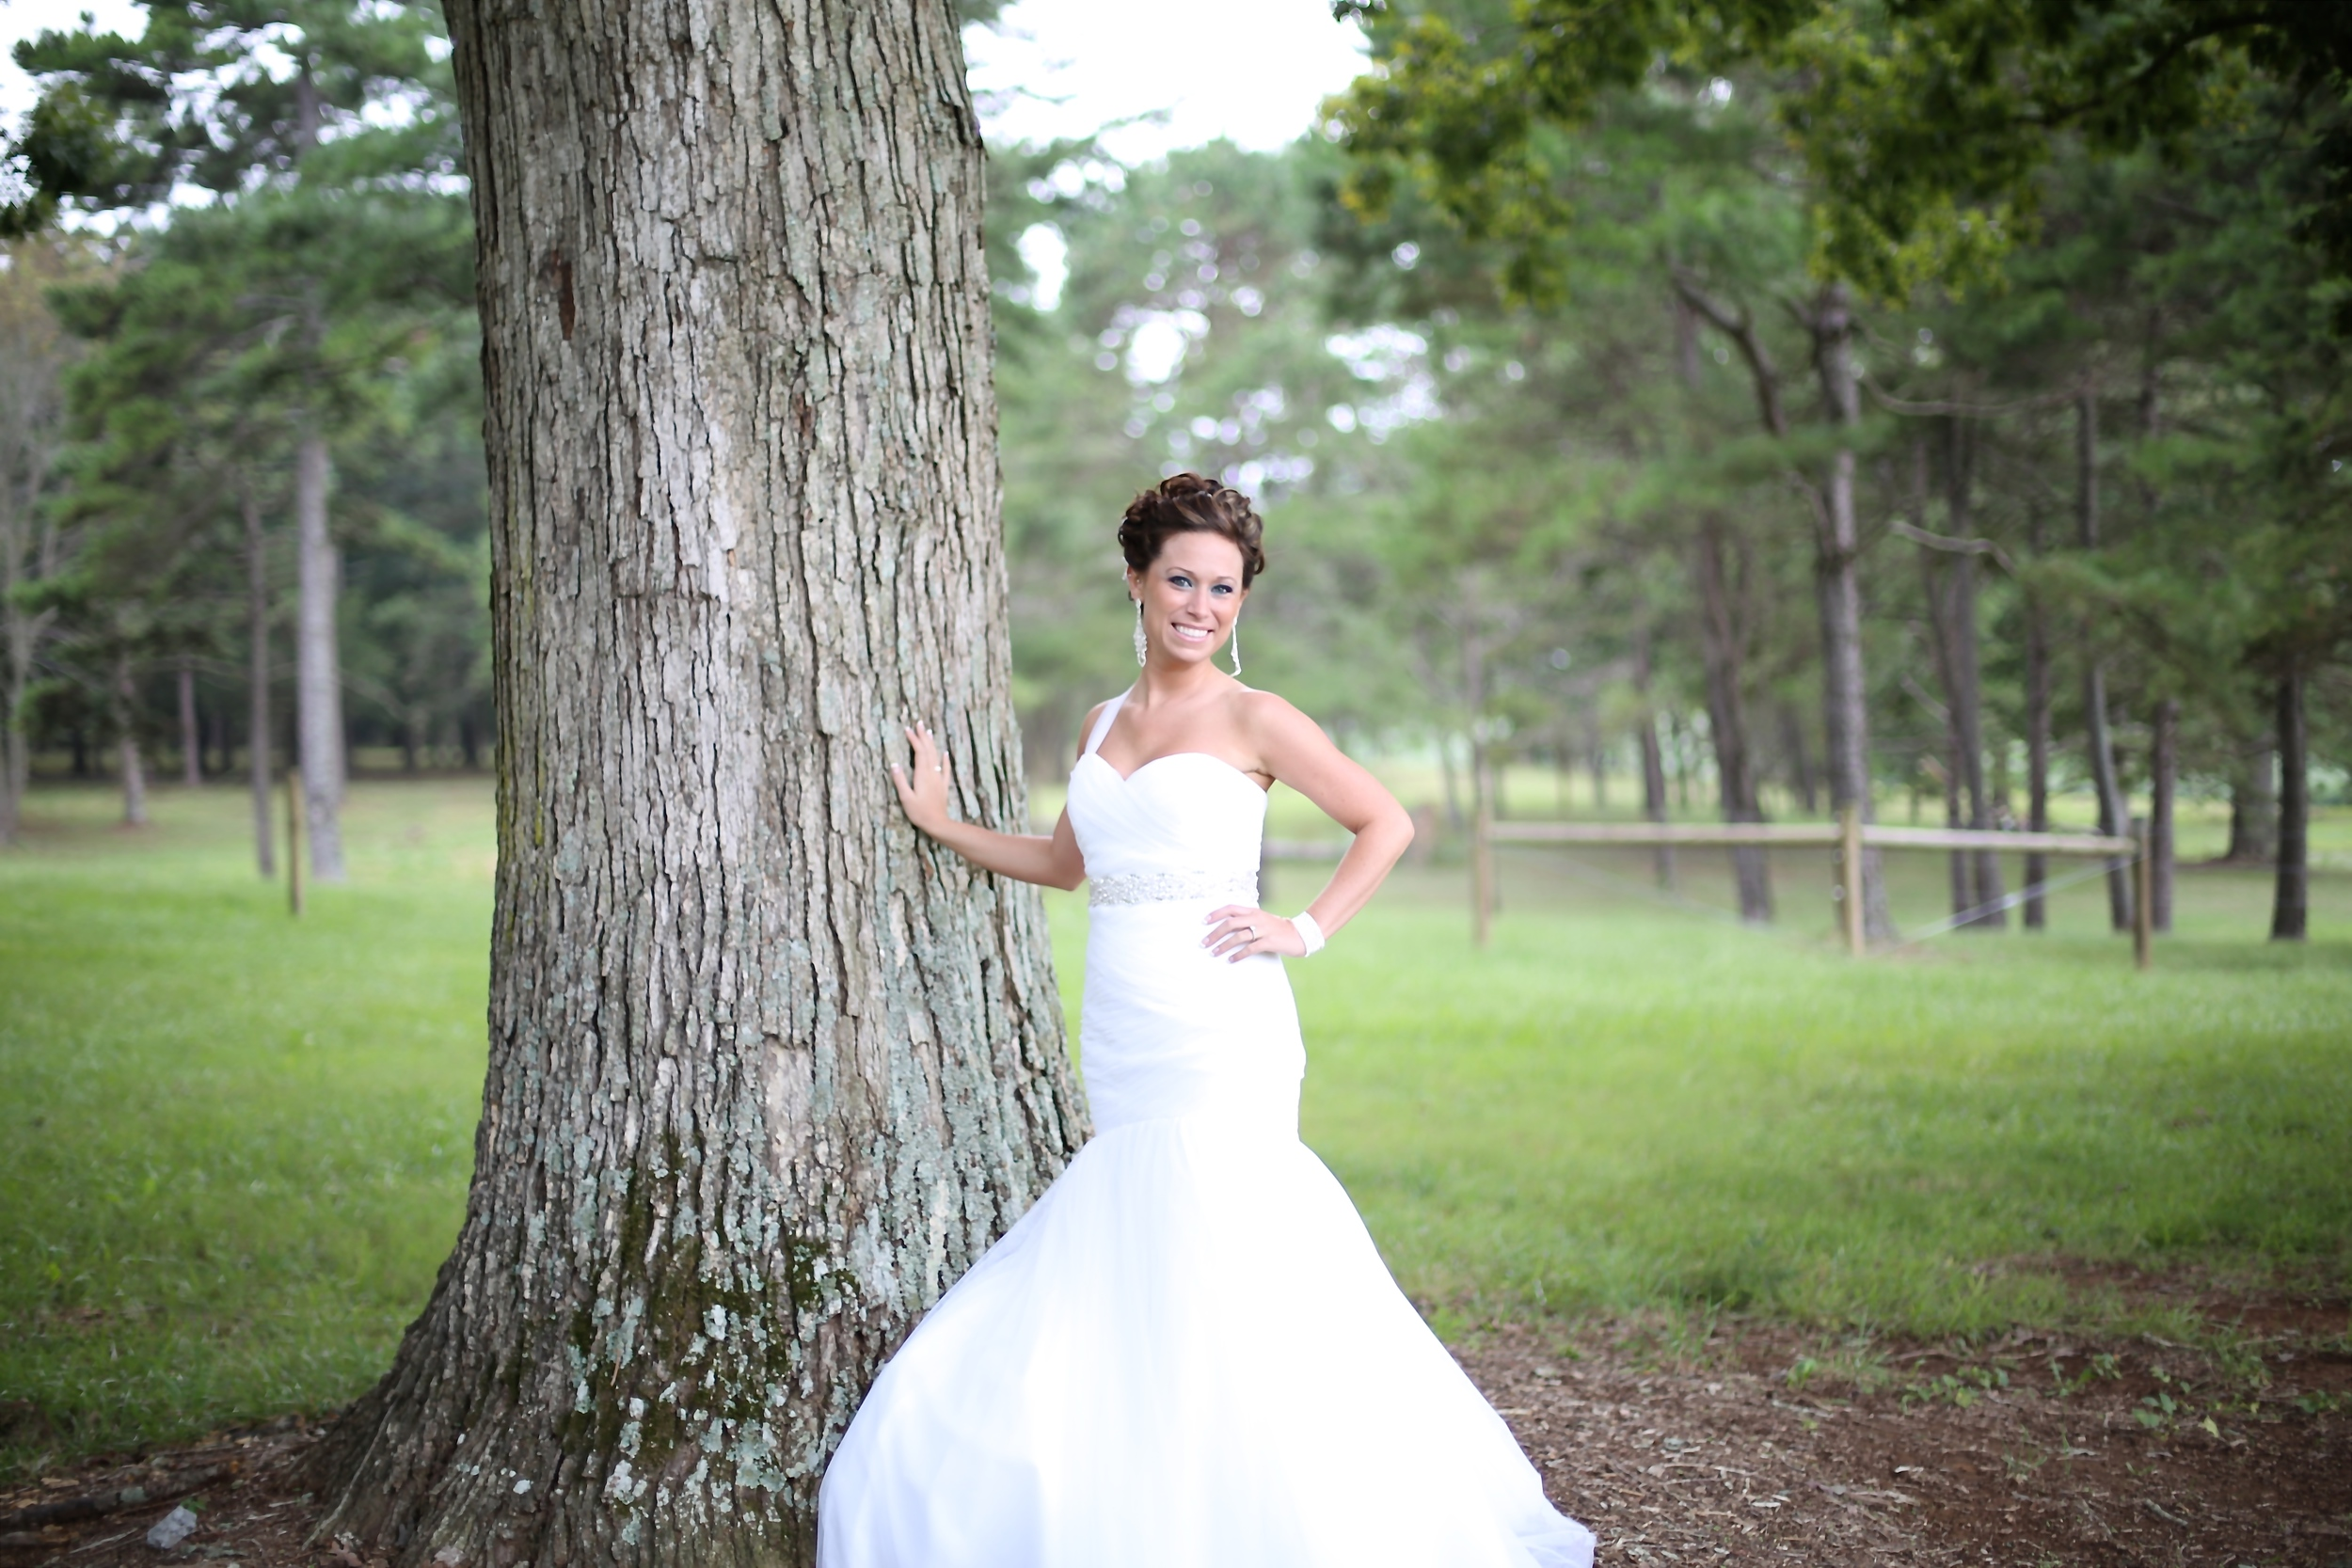 joanna bridal shoot 20